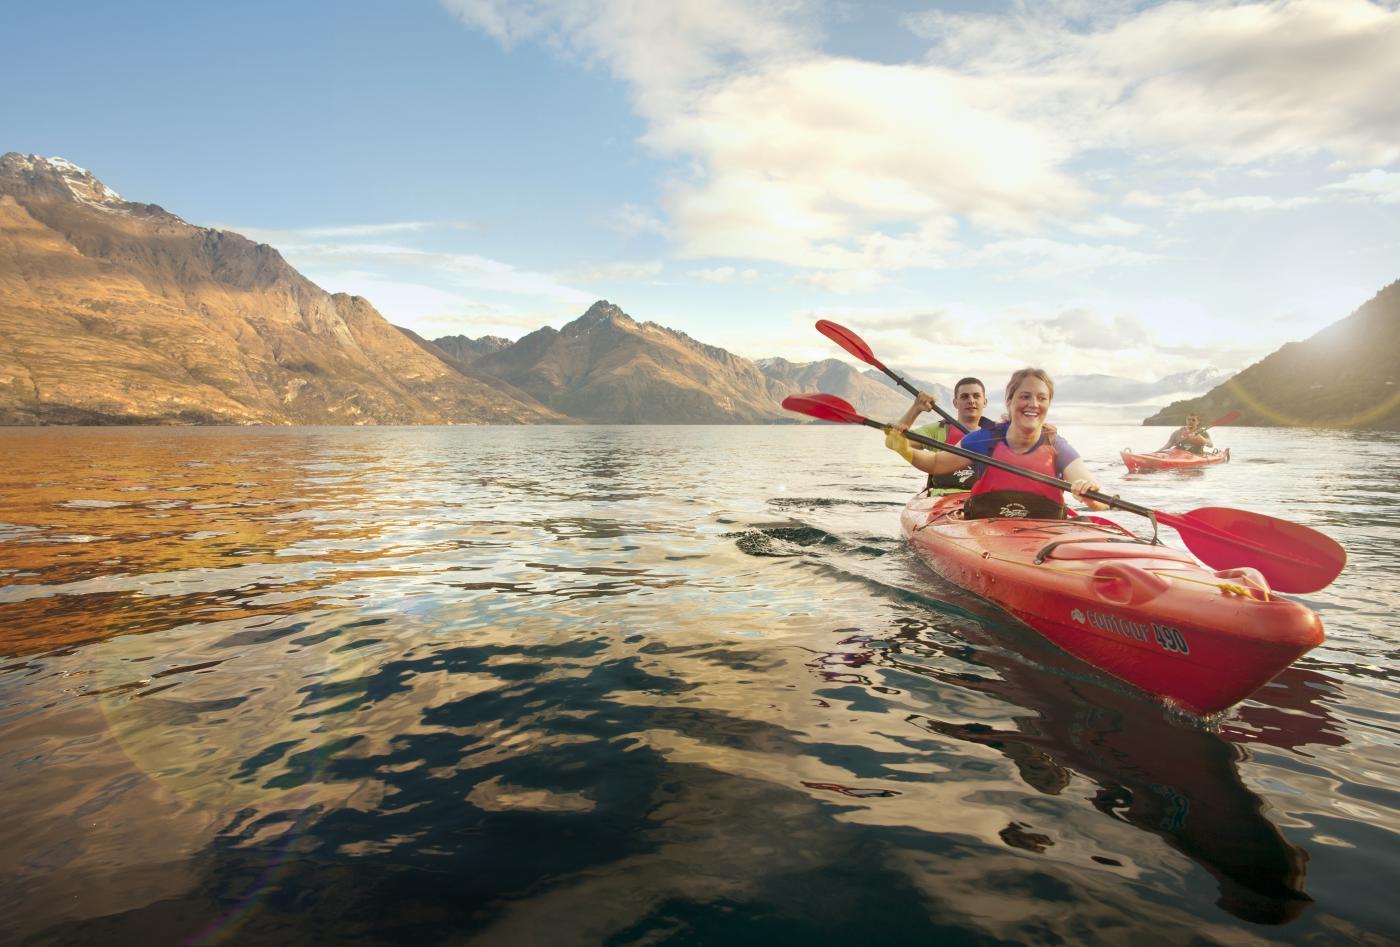 Kayaking on Lake Wakatipu in Queenstown